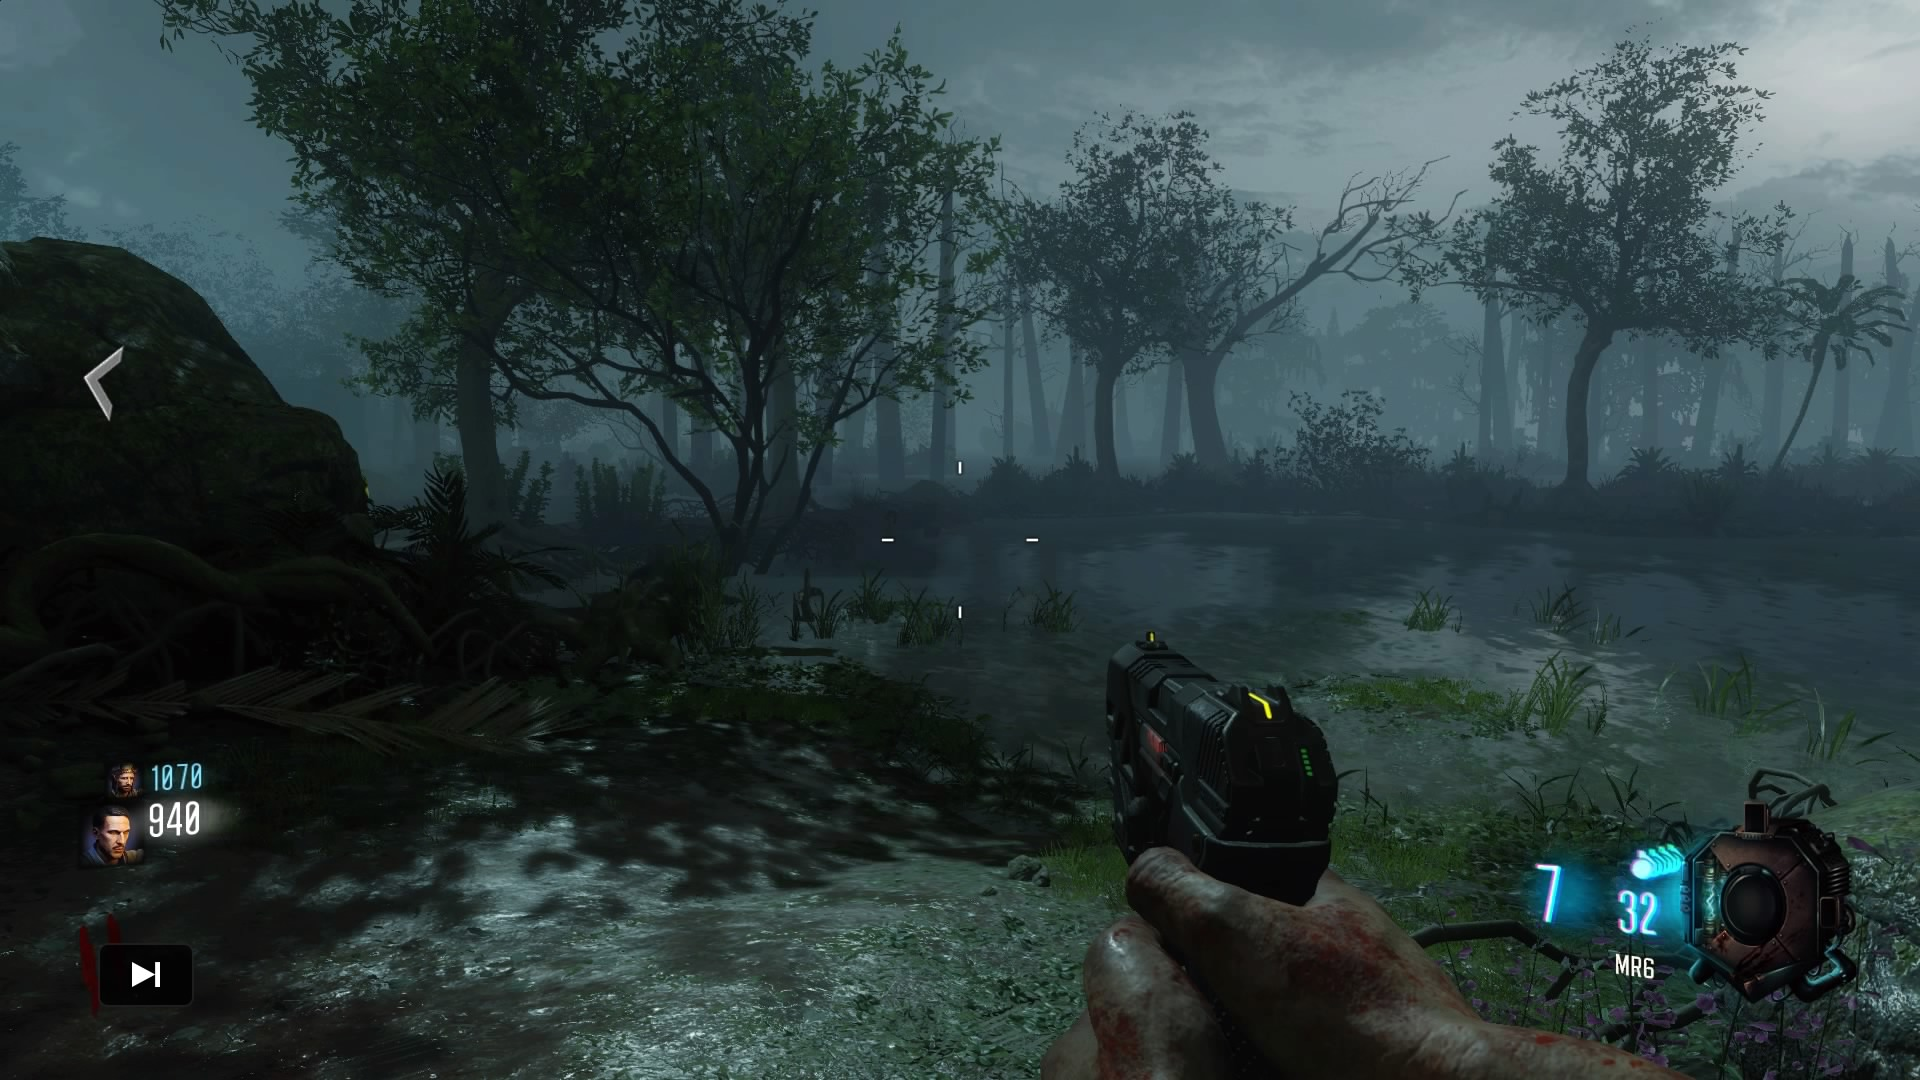 CallofDuty-BlackOpsIII-Eclipse PS4 Test 017